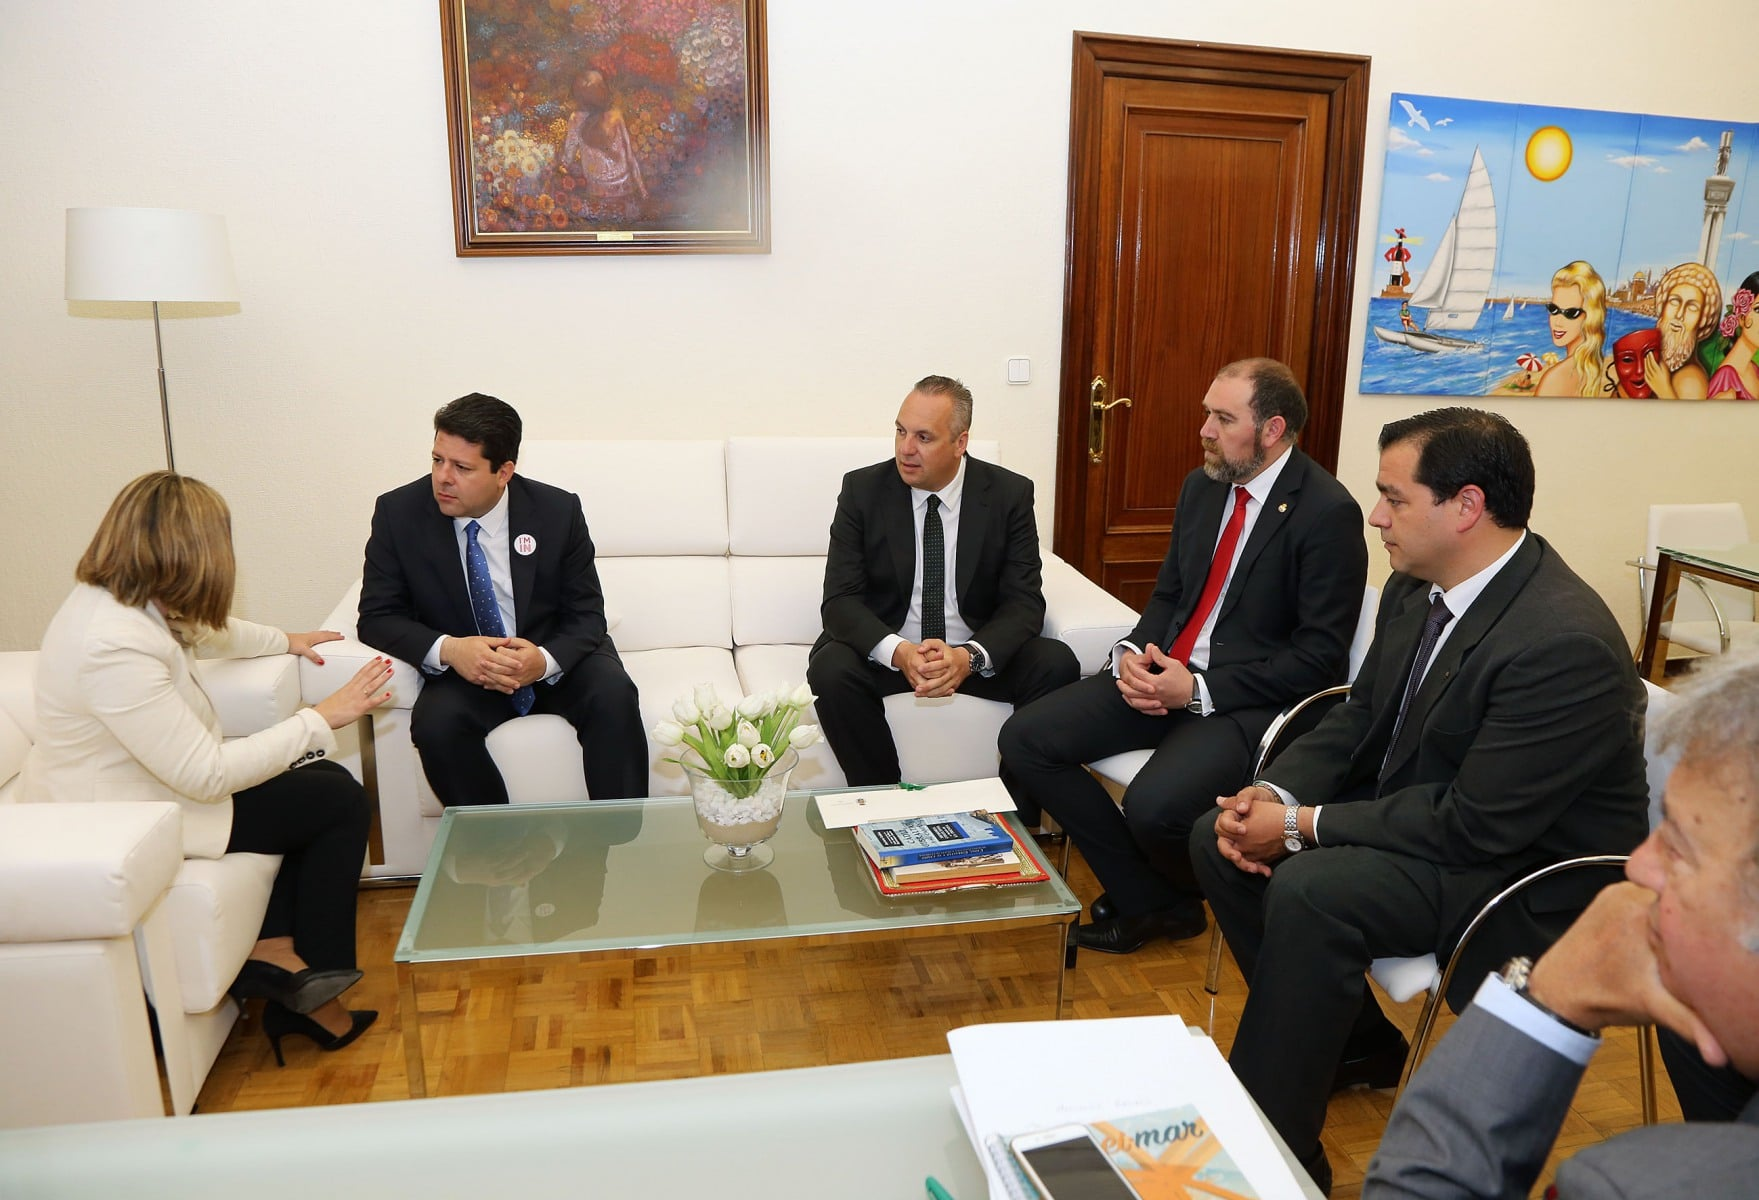 visita-del-ministro-principal-a-cdiz_26431297392_o